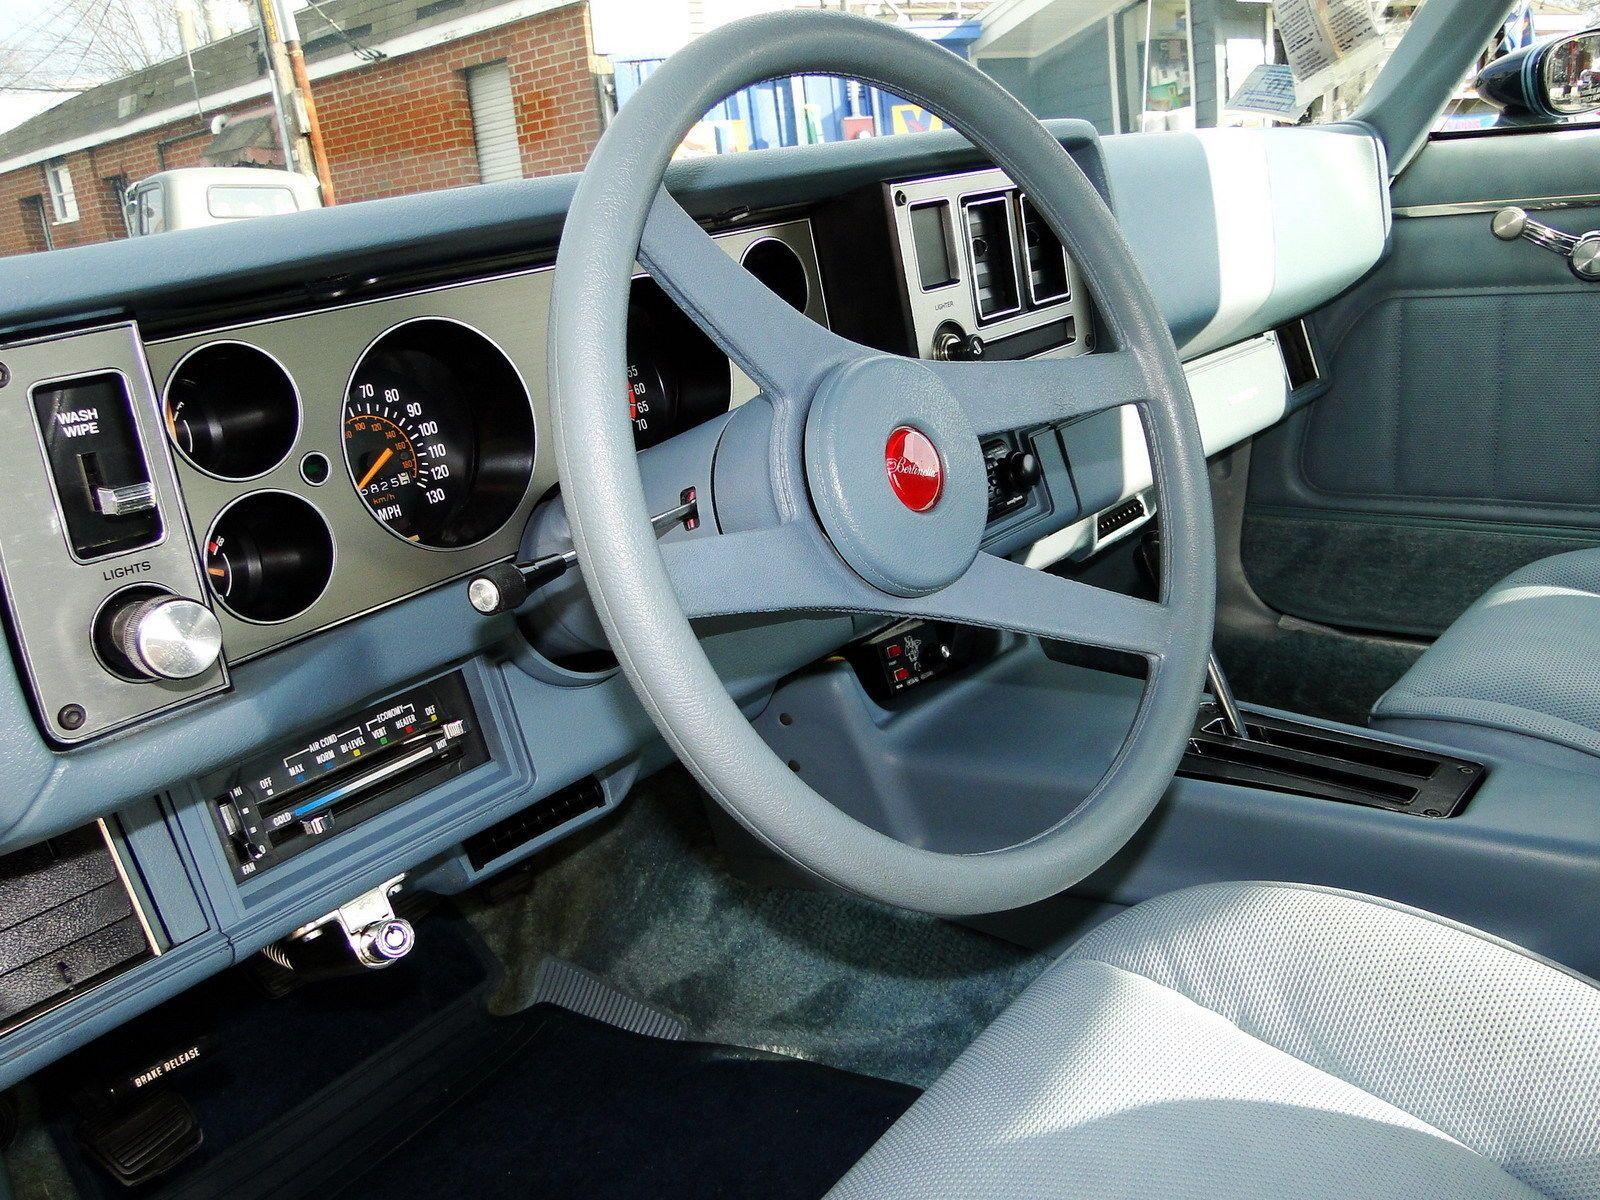 1979 Camaro Berlinetta - perfect interior! | Cars I'd love